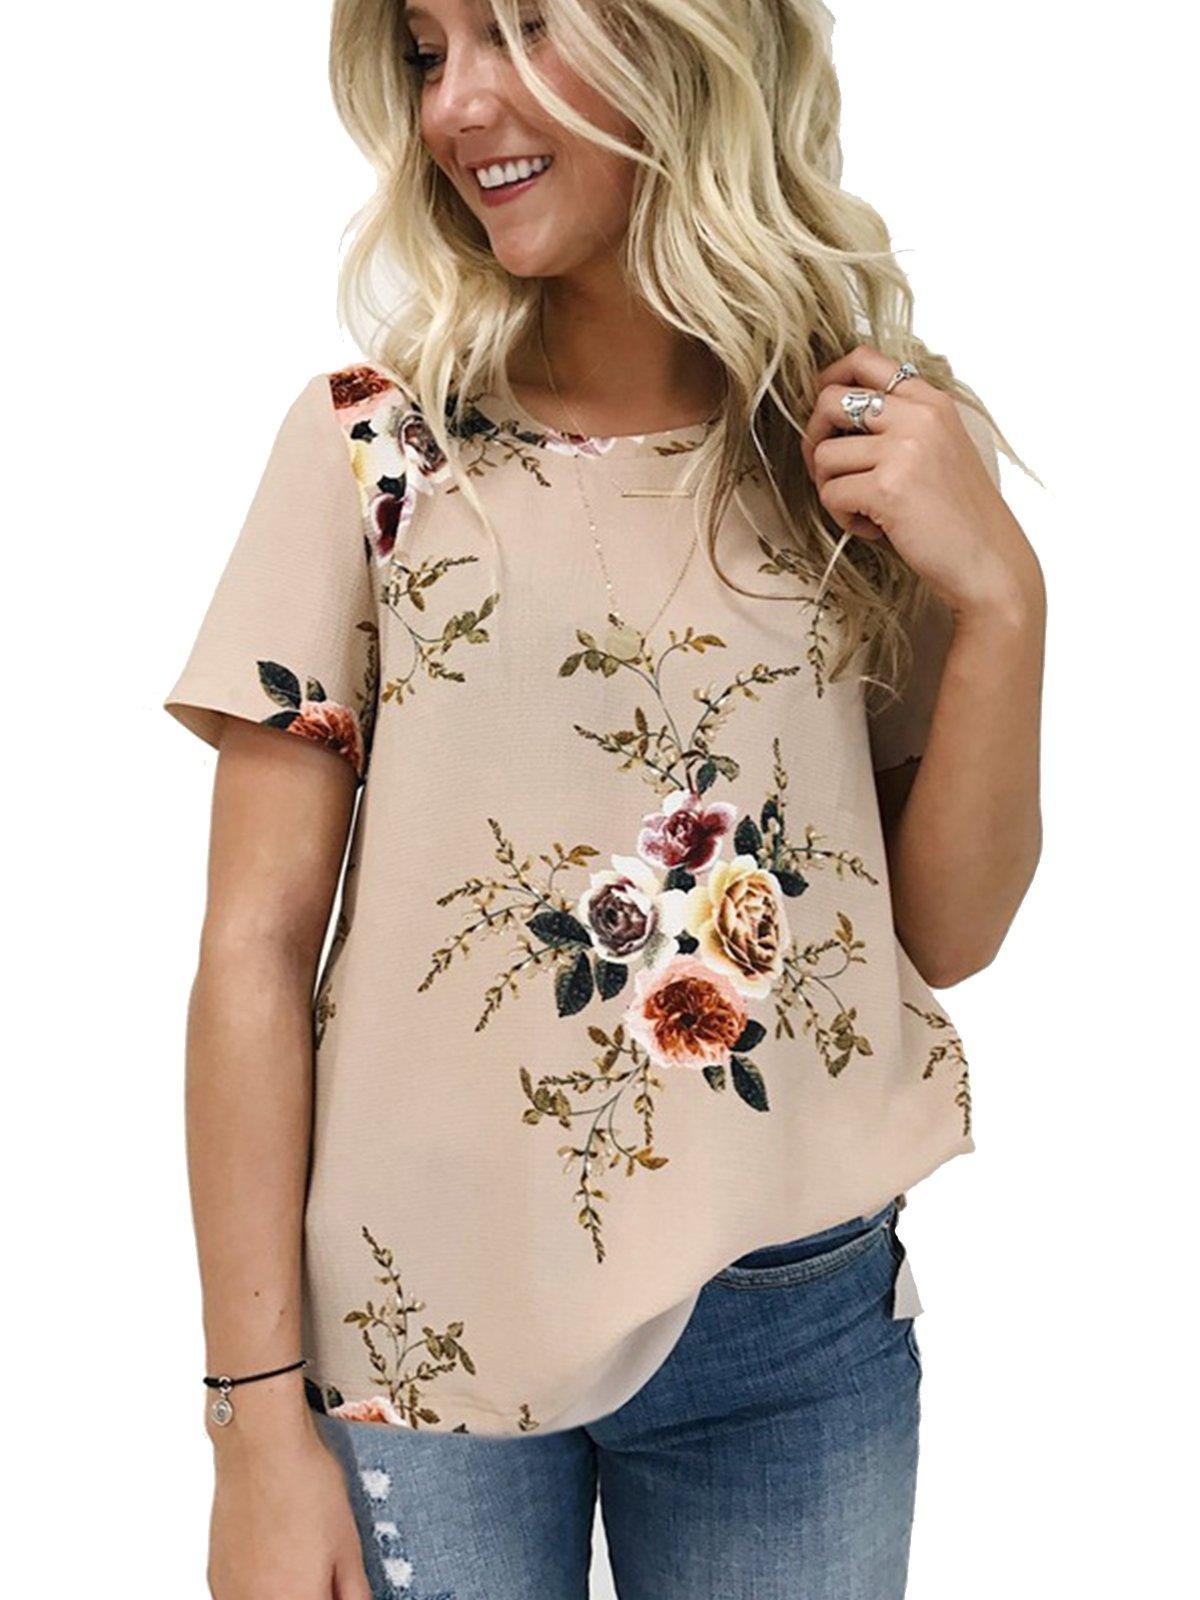 VYNCS Women's O Neck Short Sleeve Sexy Tops Floral Print Chiffon T-Shirt for Summer (Khaki, Large)